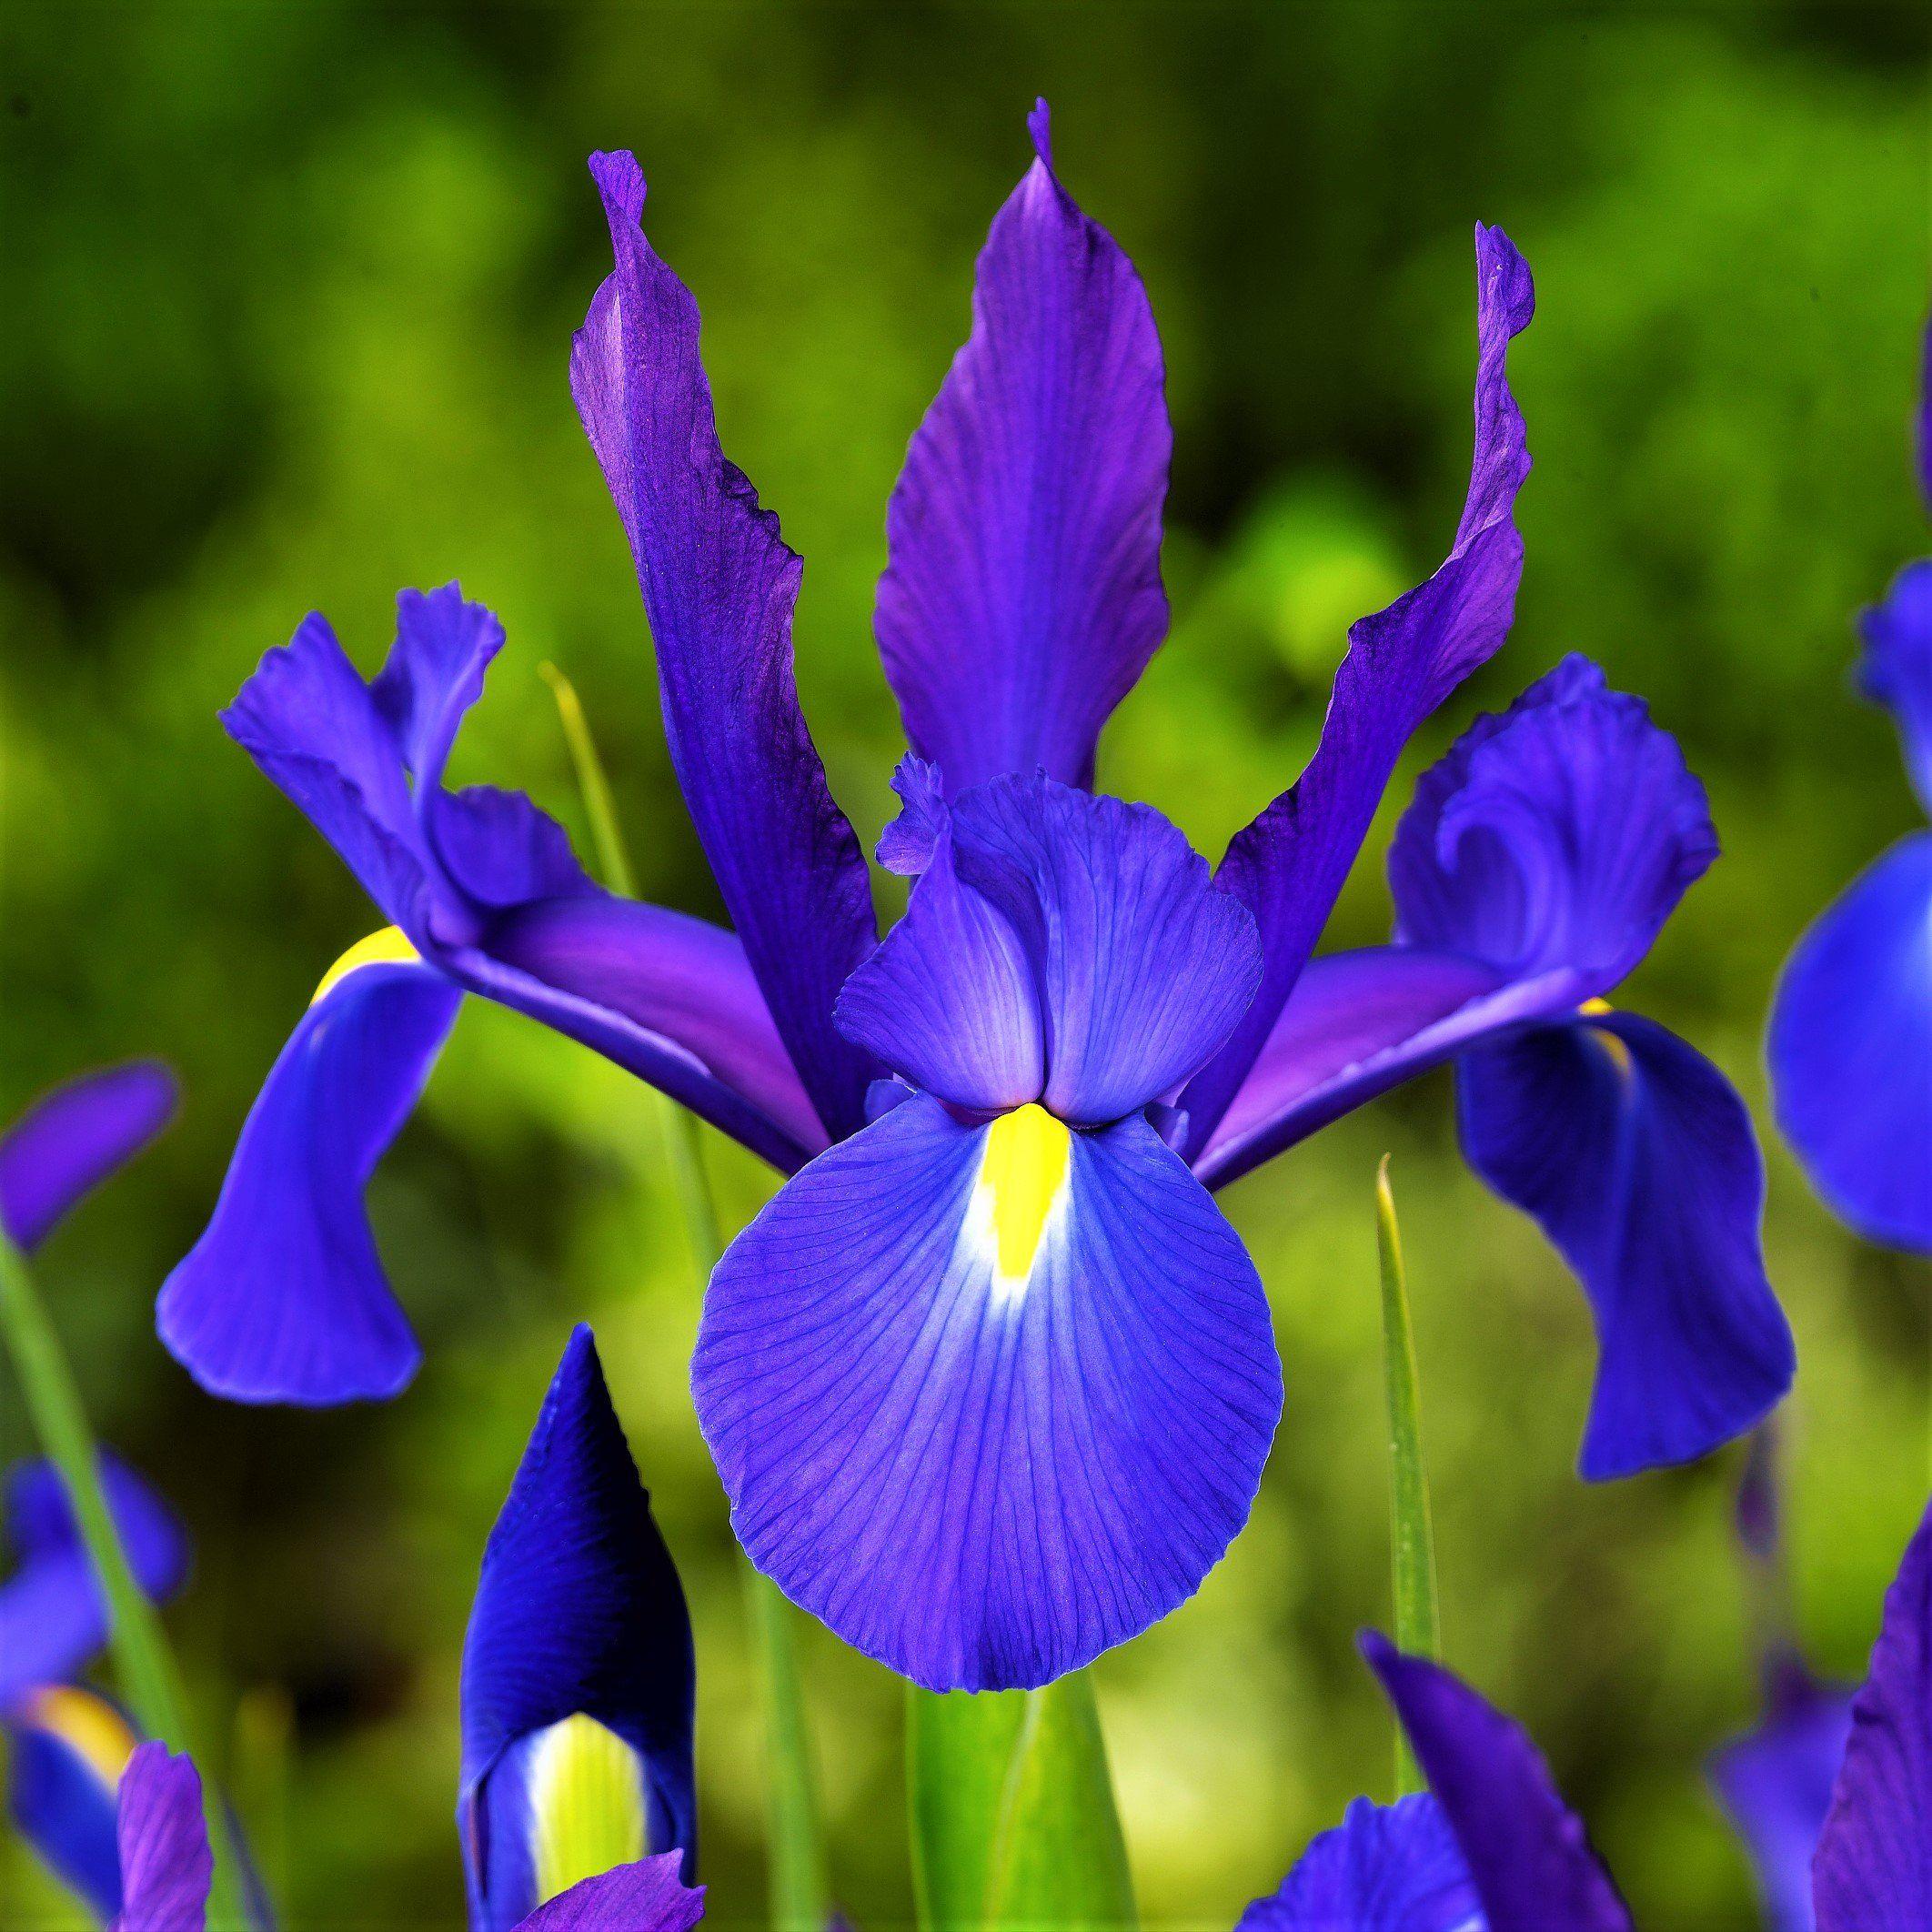 Allium Ampeloprasum Dutch Iris Blue Iris Flowers Iris Flowers